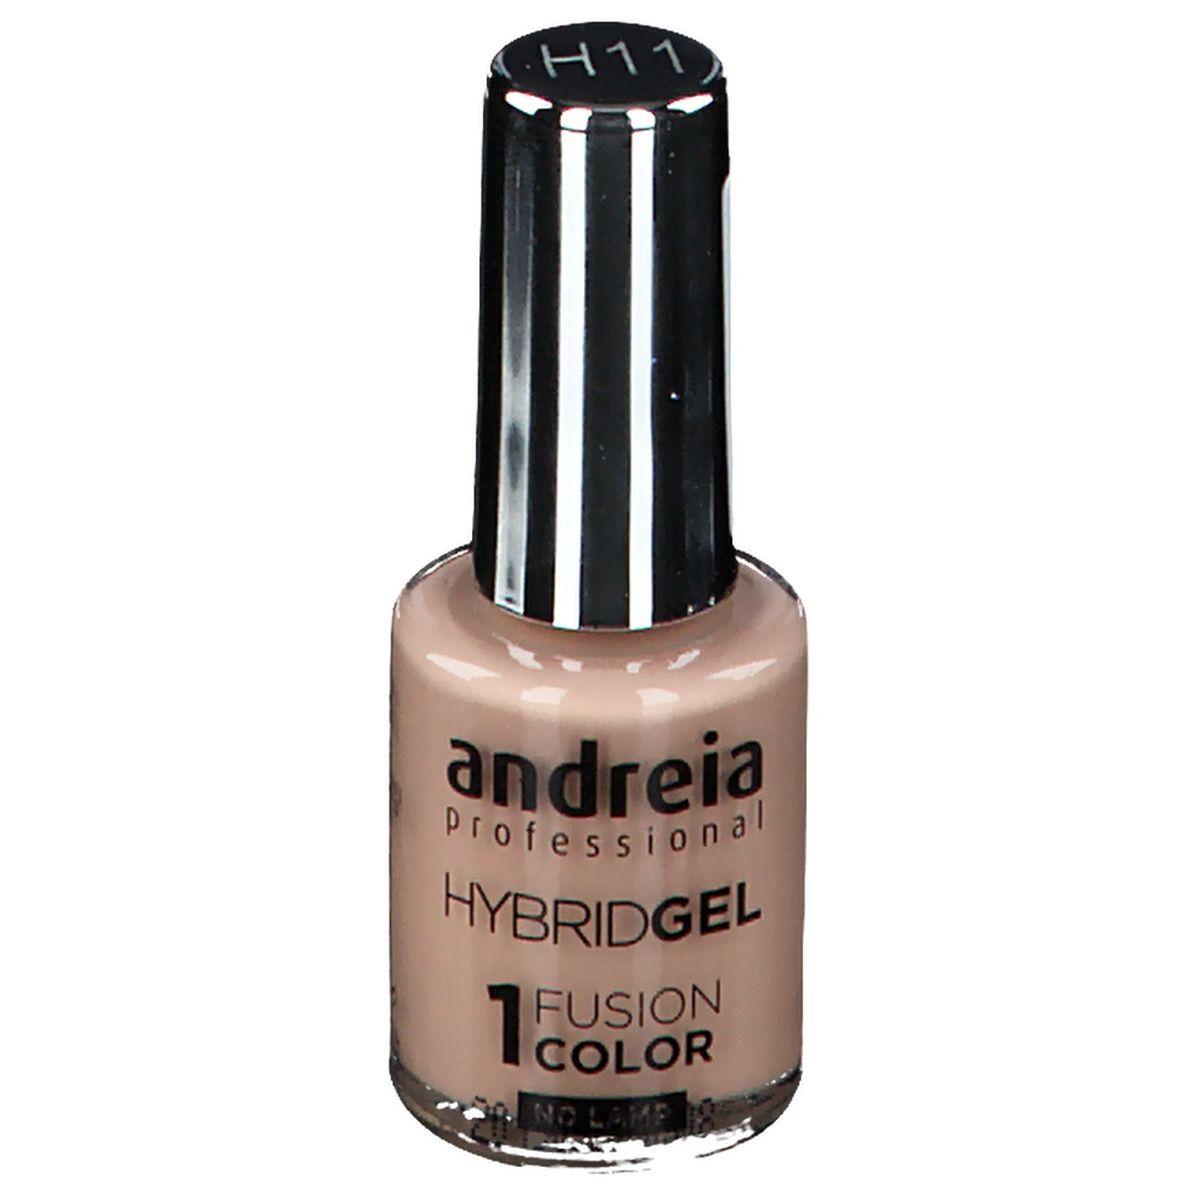 Image of Andreia Hybrid Nagellack Gel Fusion Color H11 Vanille